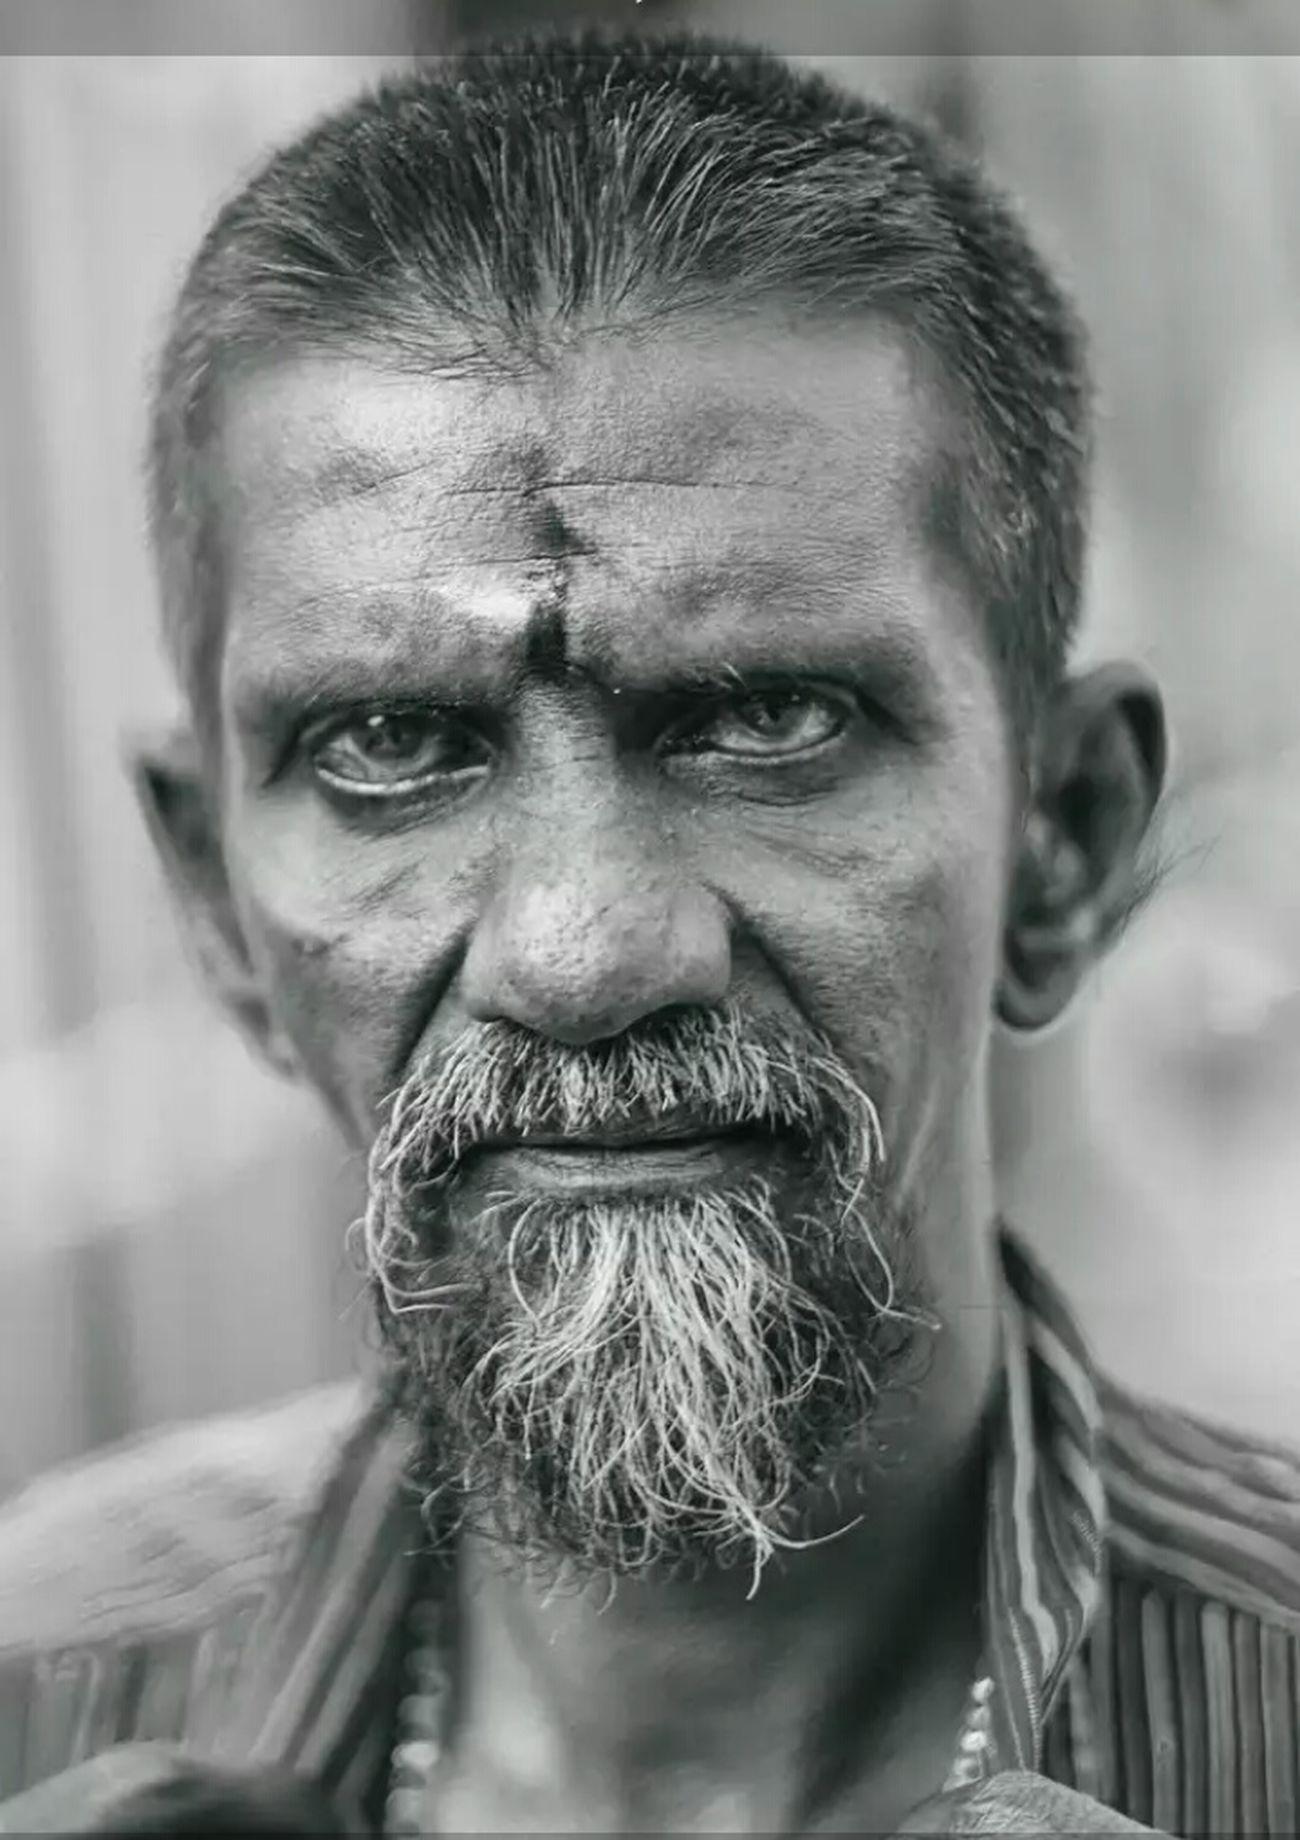 Portrait Blackandwhite Thaipusam 2013 Batucaves #thaipusam